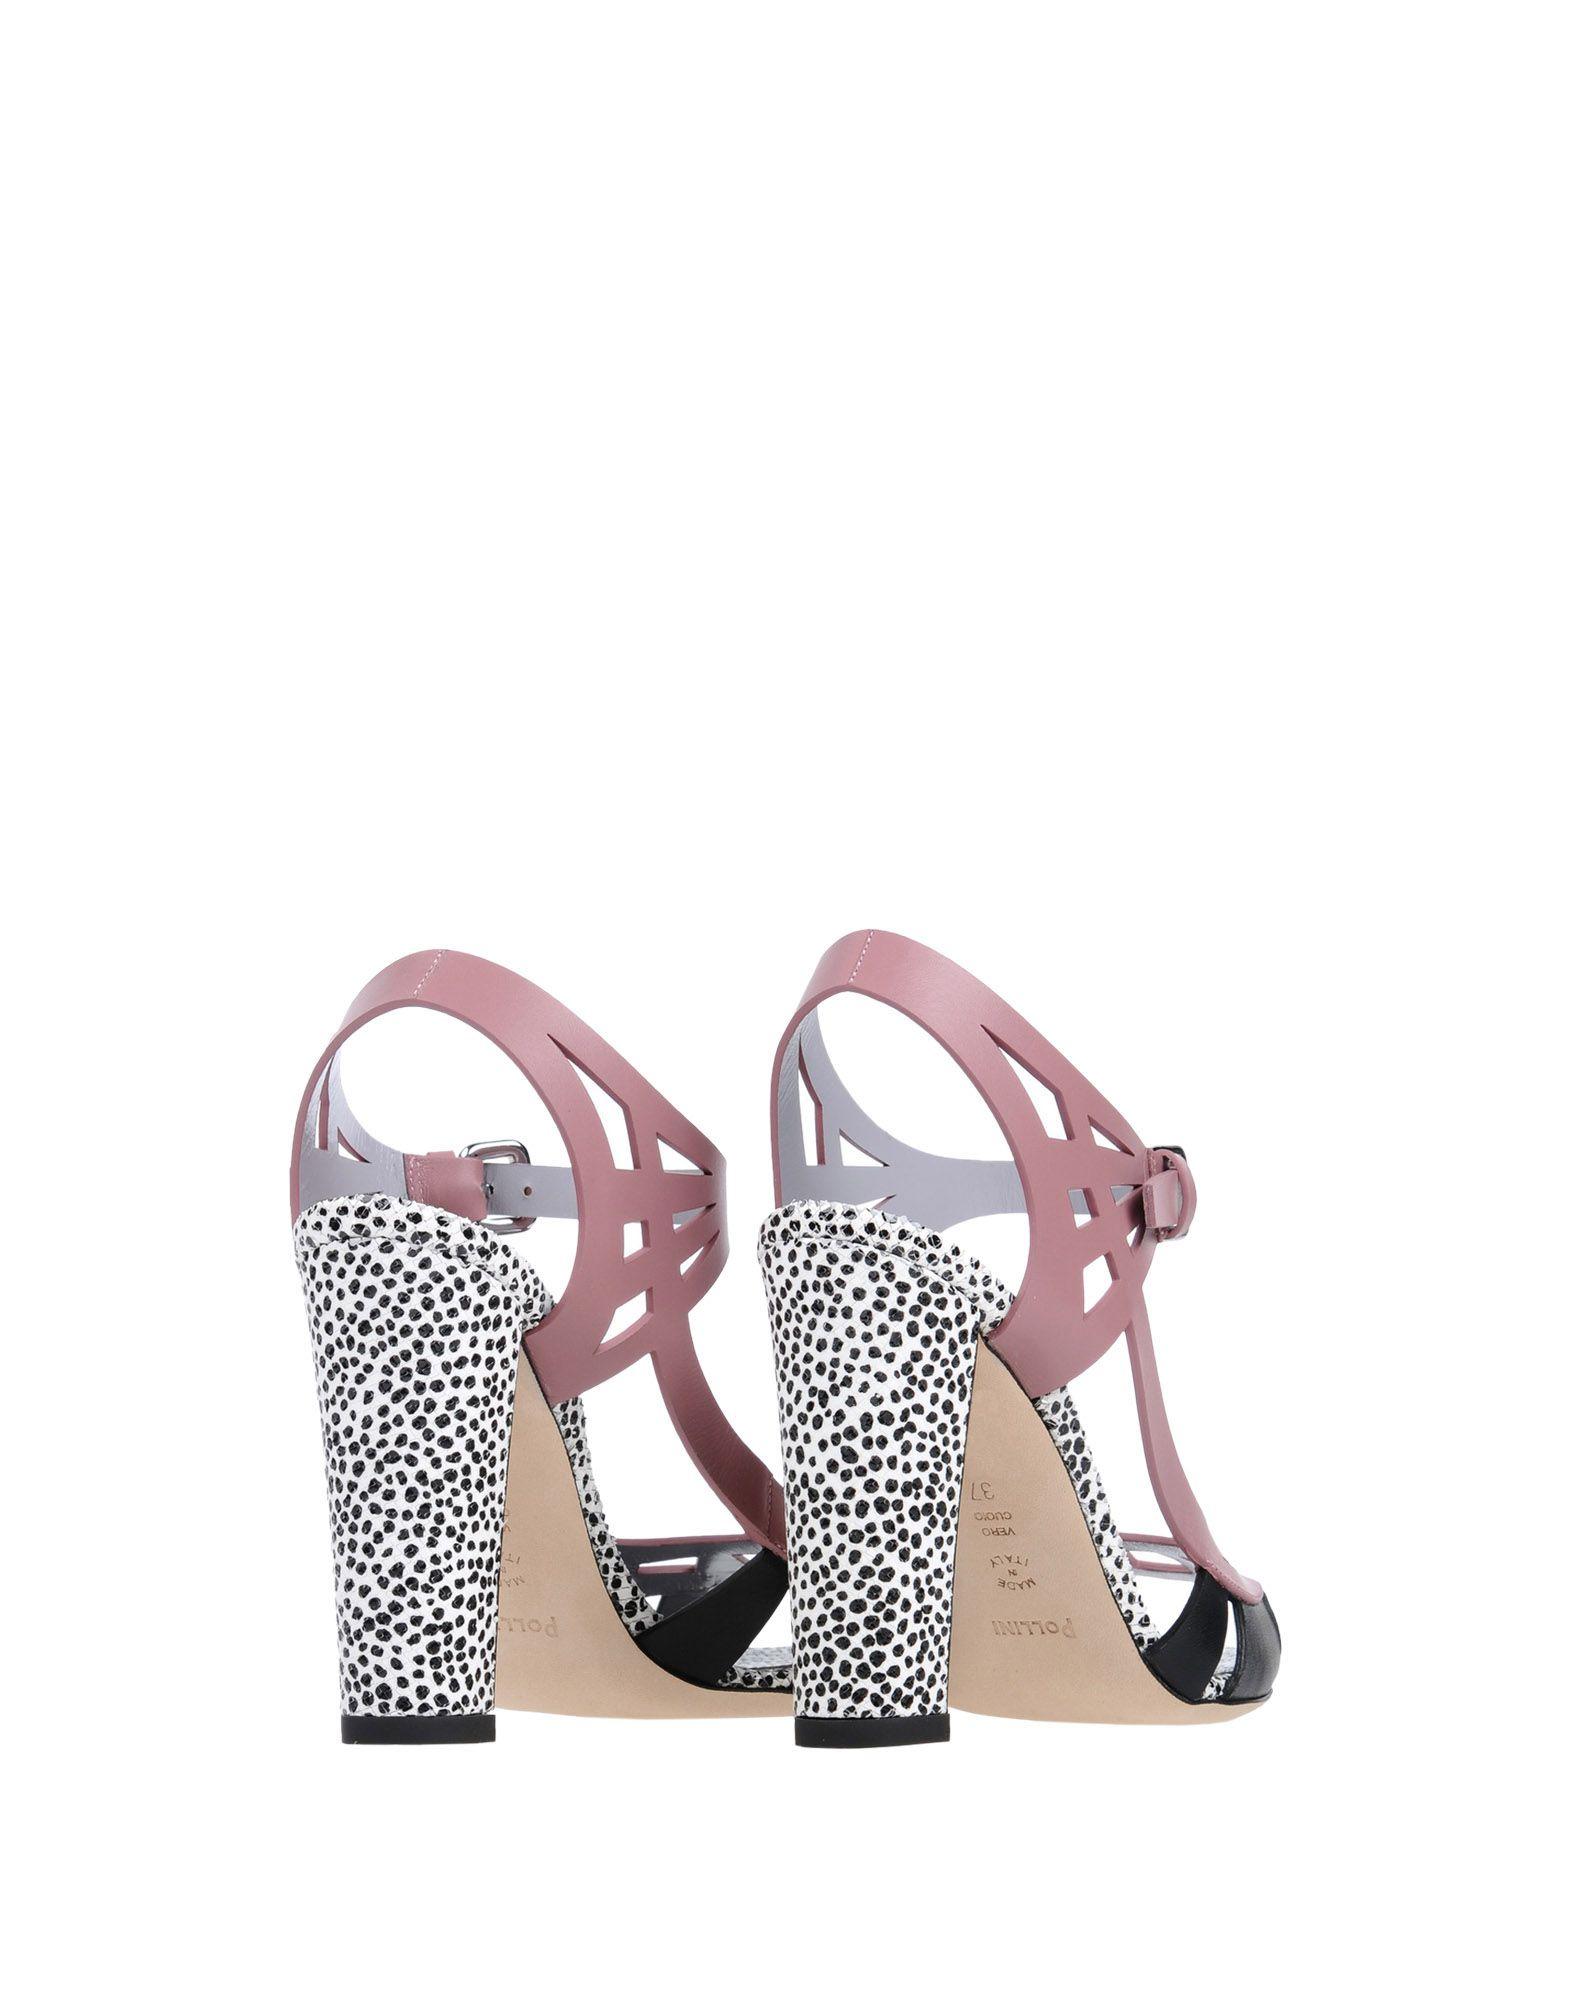 Pollini Sandalen Damen  11331228CFGut Schuhe aussehende strapazierfähige Schuhe 11331228CFGut aee9e3